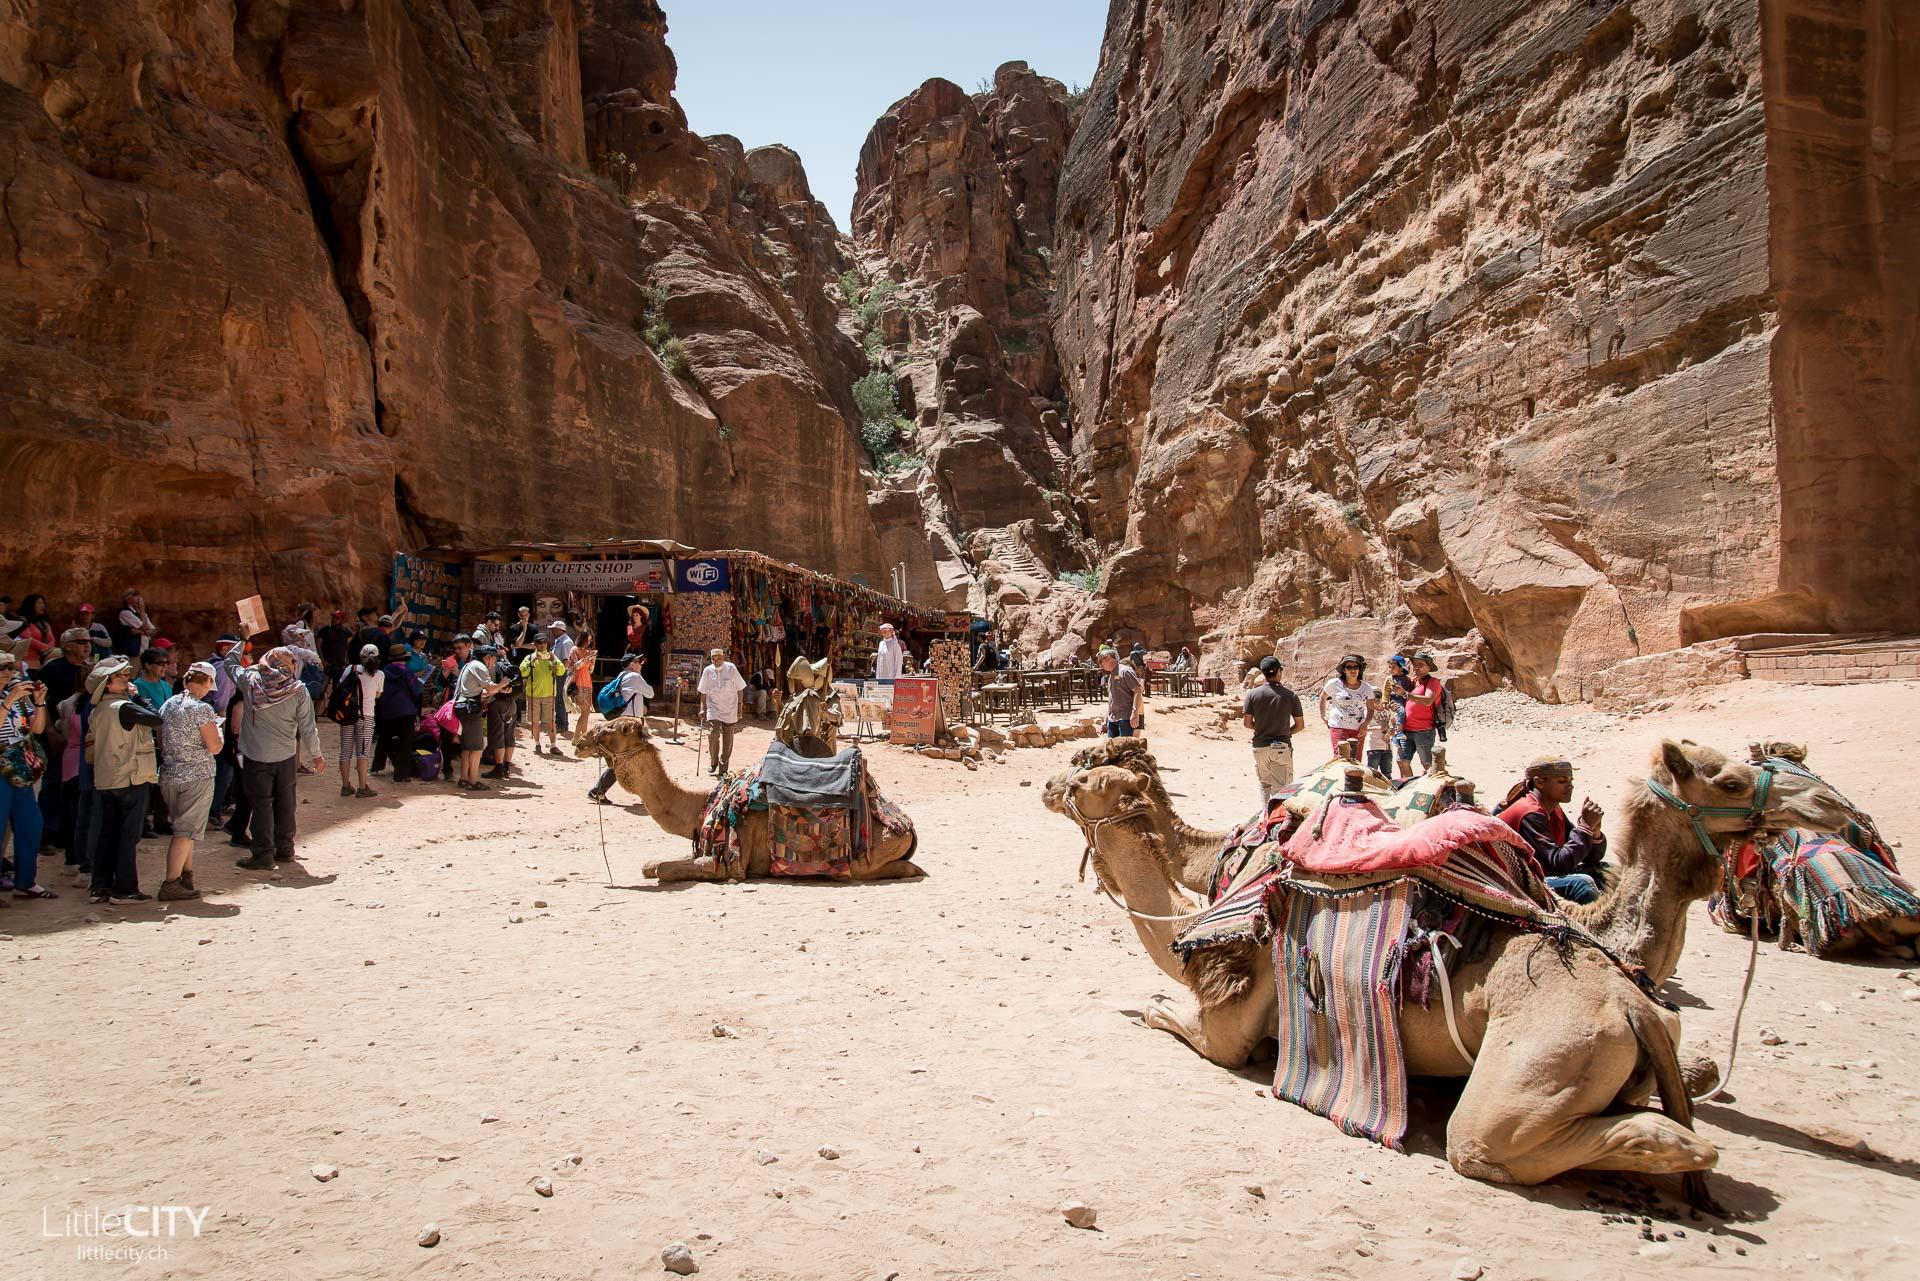 Petra Jordanien Bauwerke & Touristen